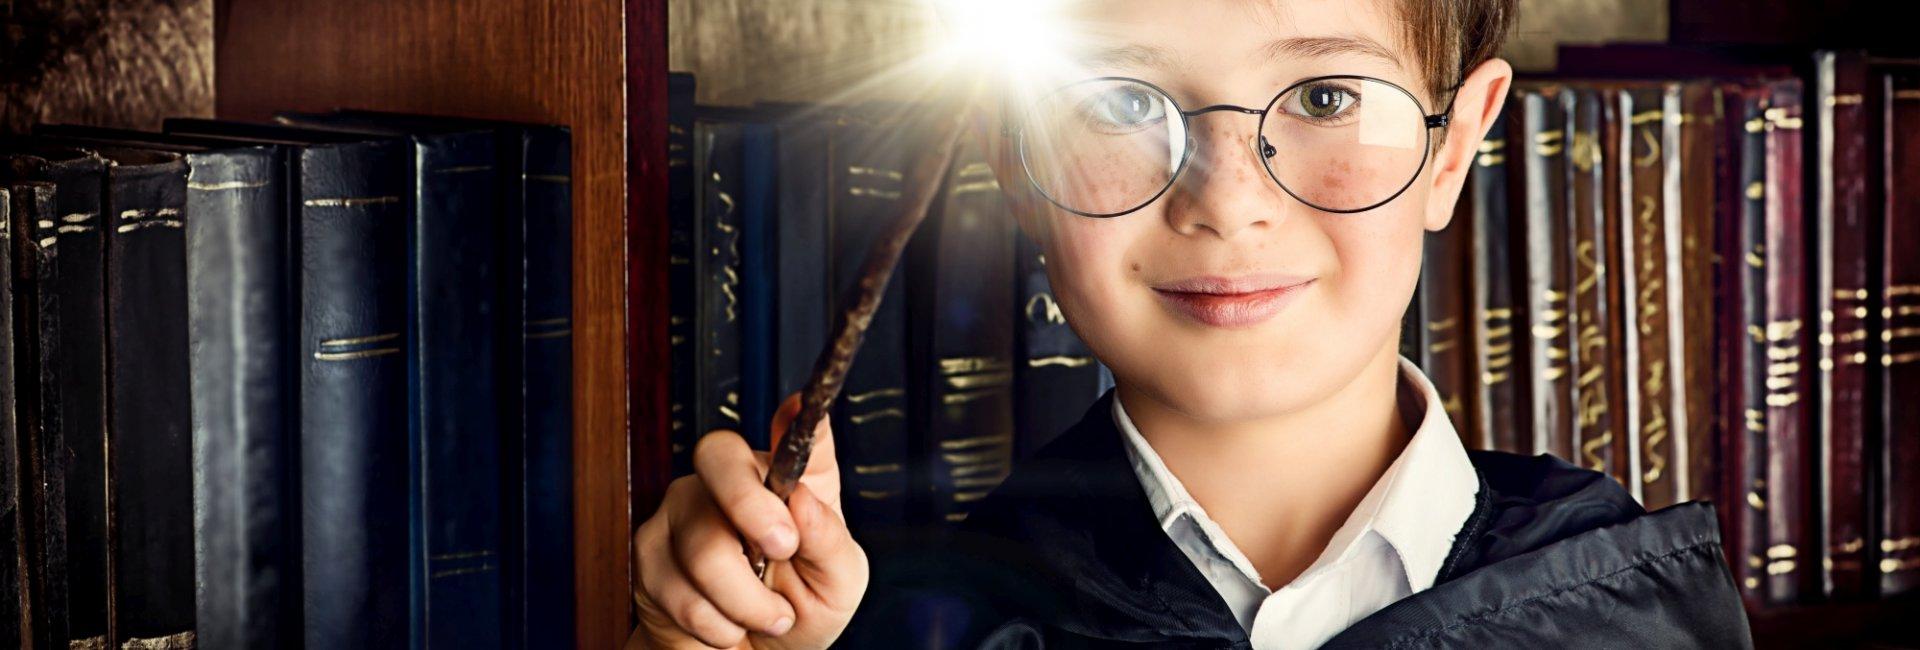 Ferie z Harrym Potterem 11.stycznia-20.lutego